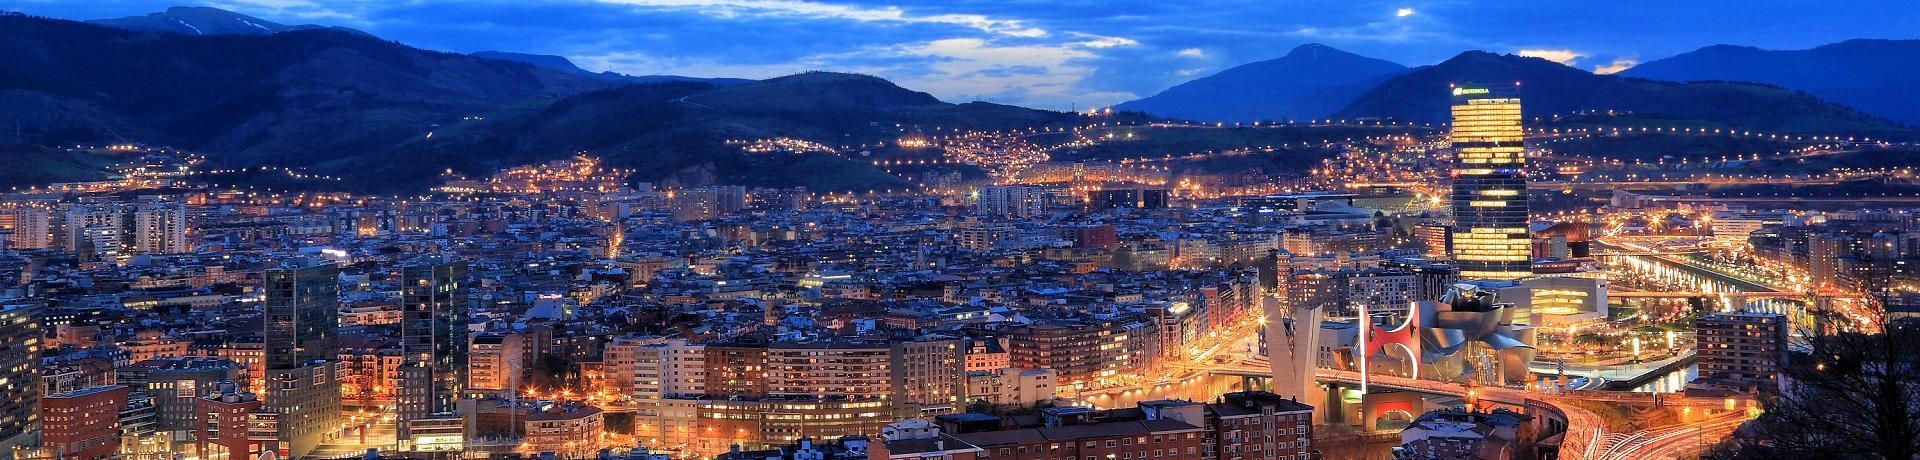 Spanien: Bilbao - Emotion